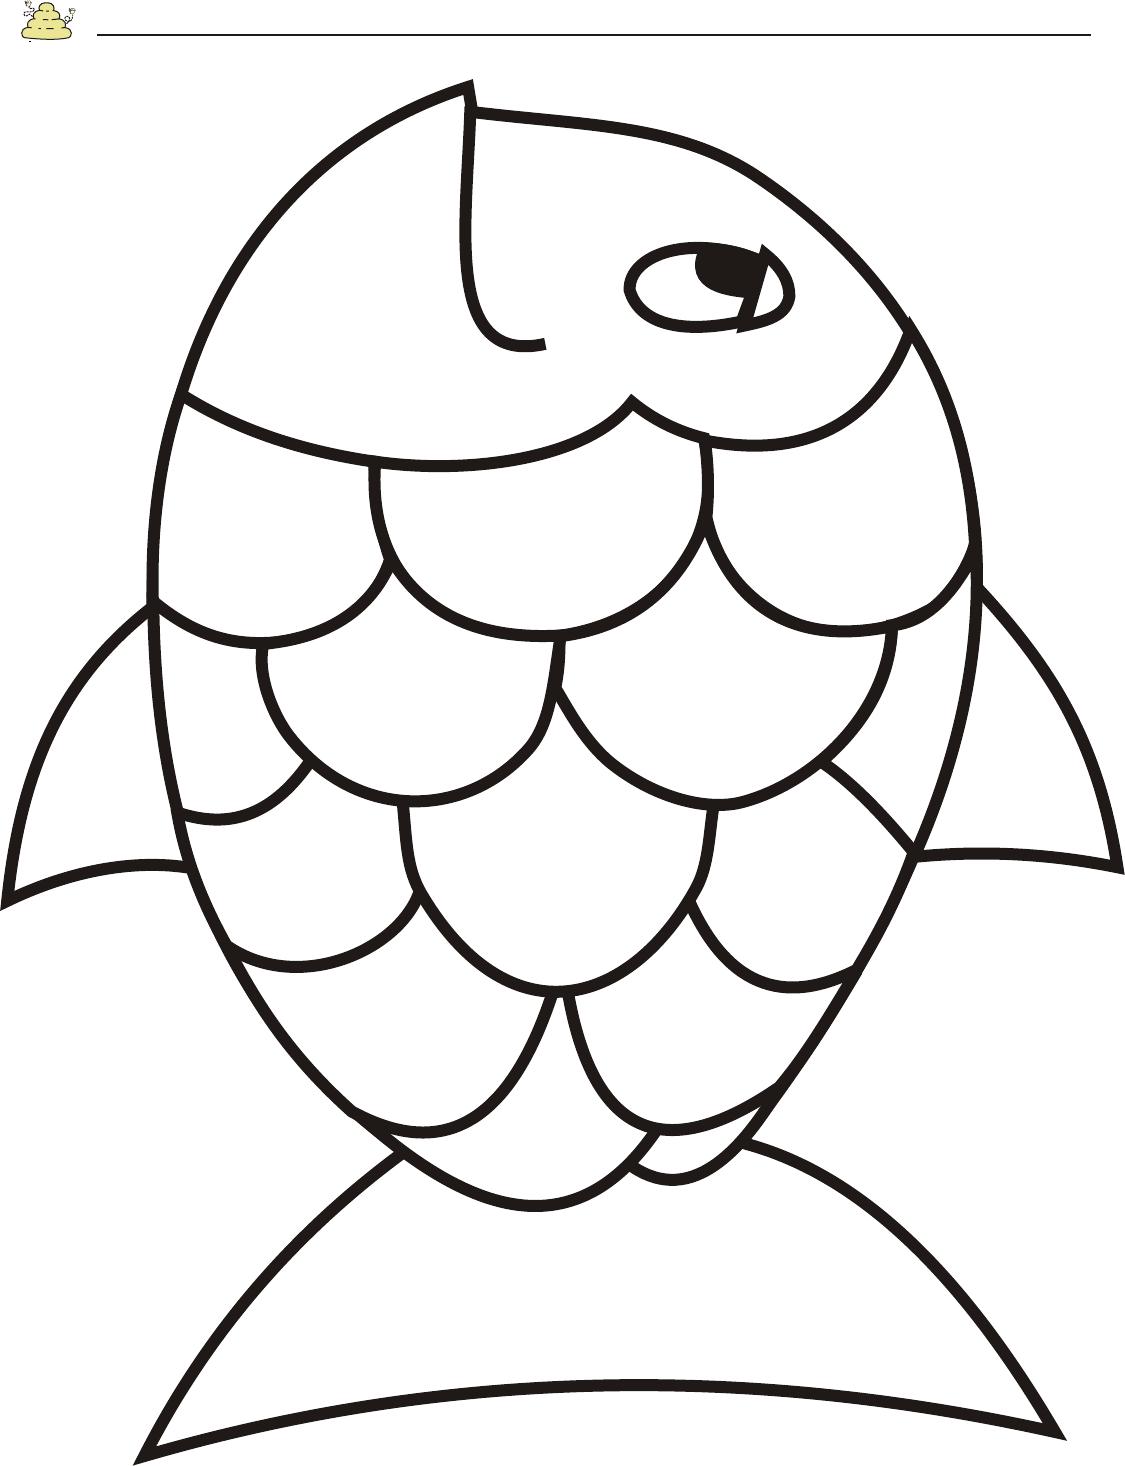 Free Rainbow Fish Template - Pdf   2 Page(S)   Page 2   Vbs - Free Printable Fish Stencils